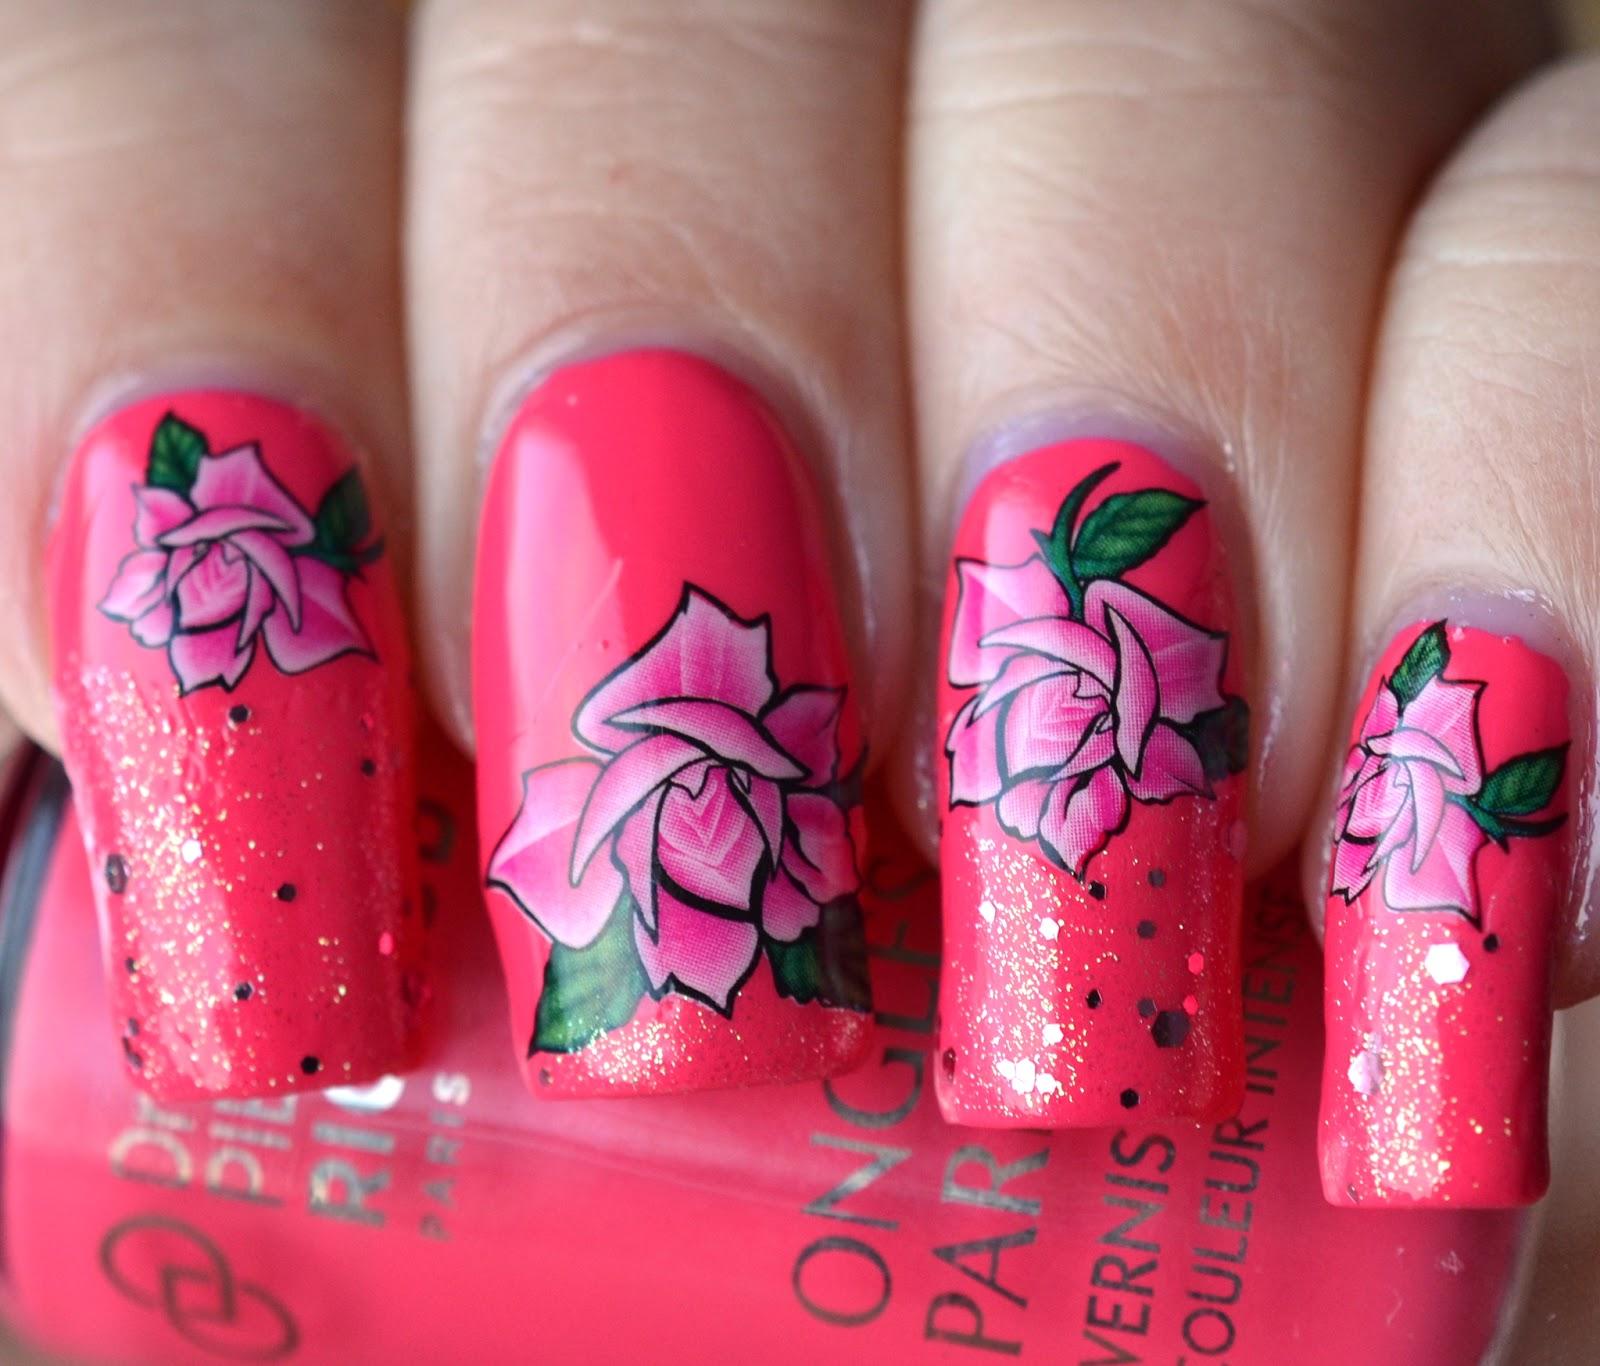 http://lenas-sofa.blogspot.de/2015/01/dr-pierre-ricaud-rose-eclatant.html